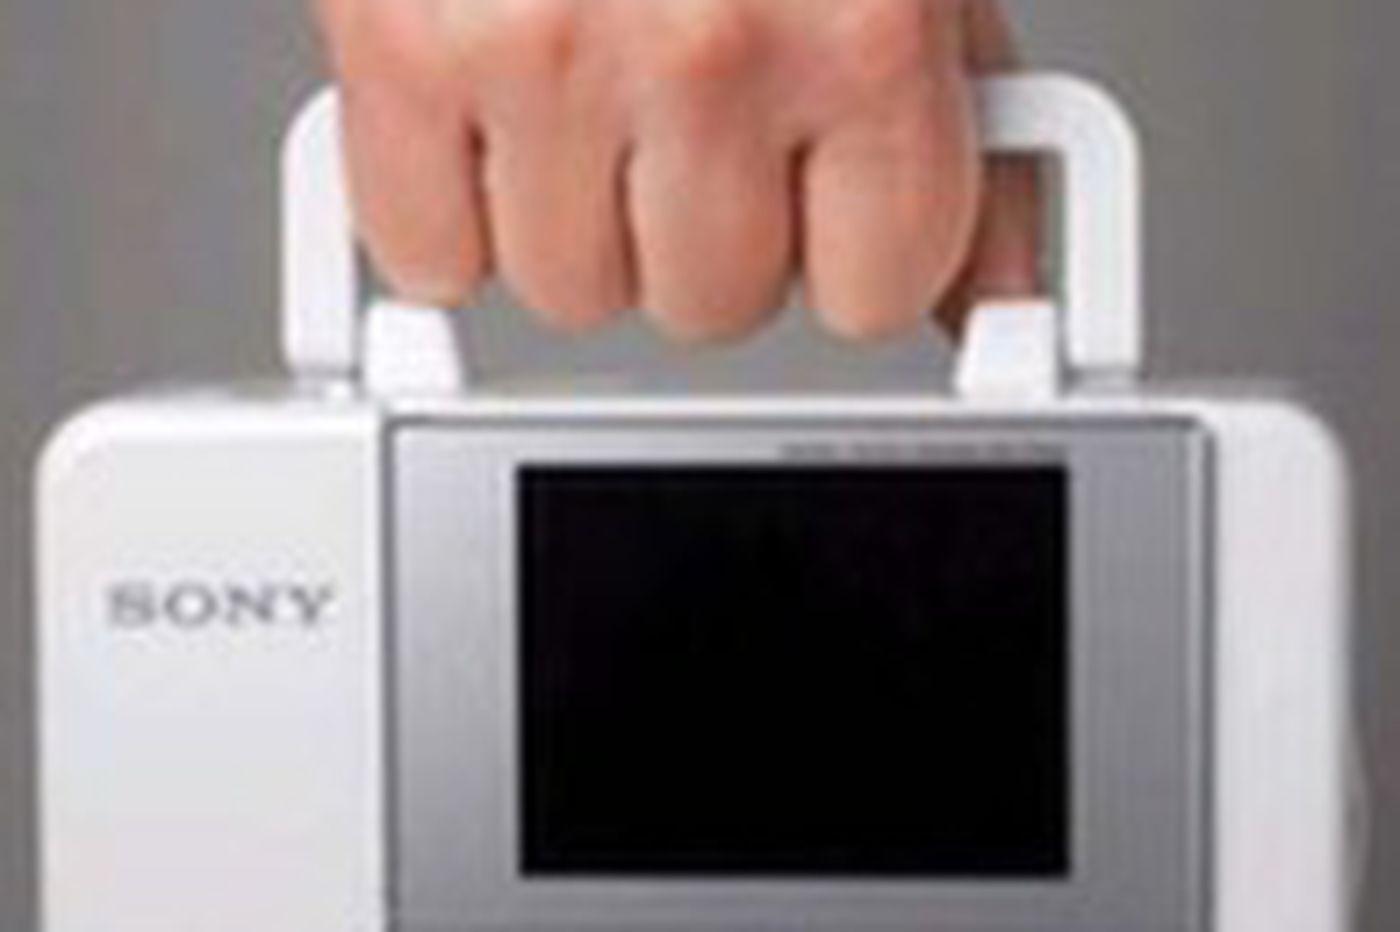 Jonathan Takiff | Sony unveils cutting-edge electronics